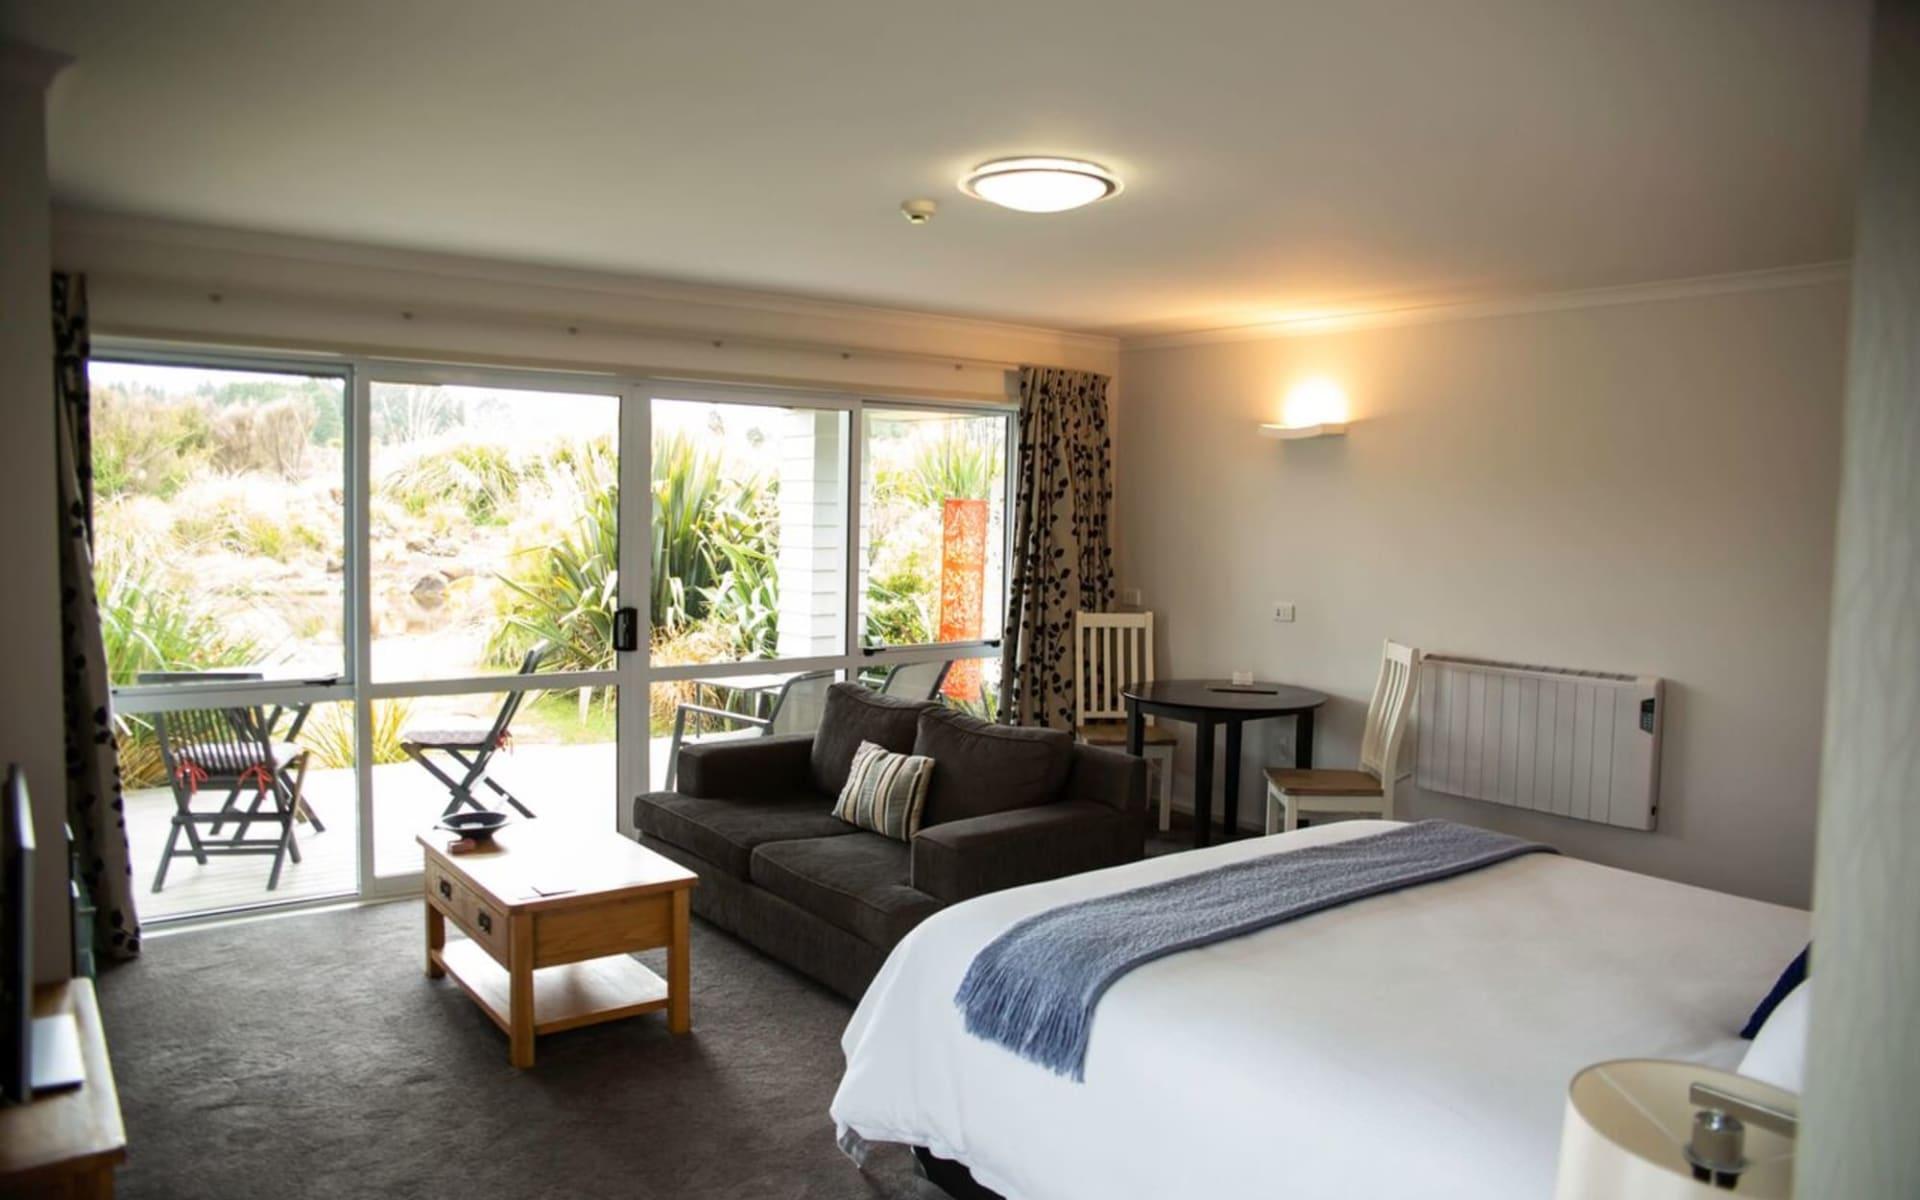 Tongariro Suites @ The Rocks in Tongariro National Park:  Zimmer Tongariro Suites @ the Rocks - Tongariro Suite Interior cTongariro Suites